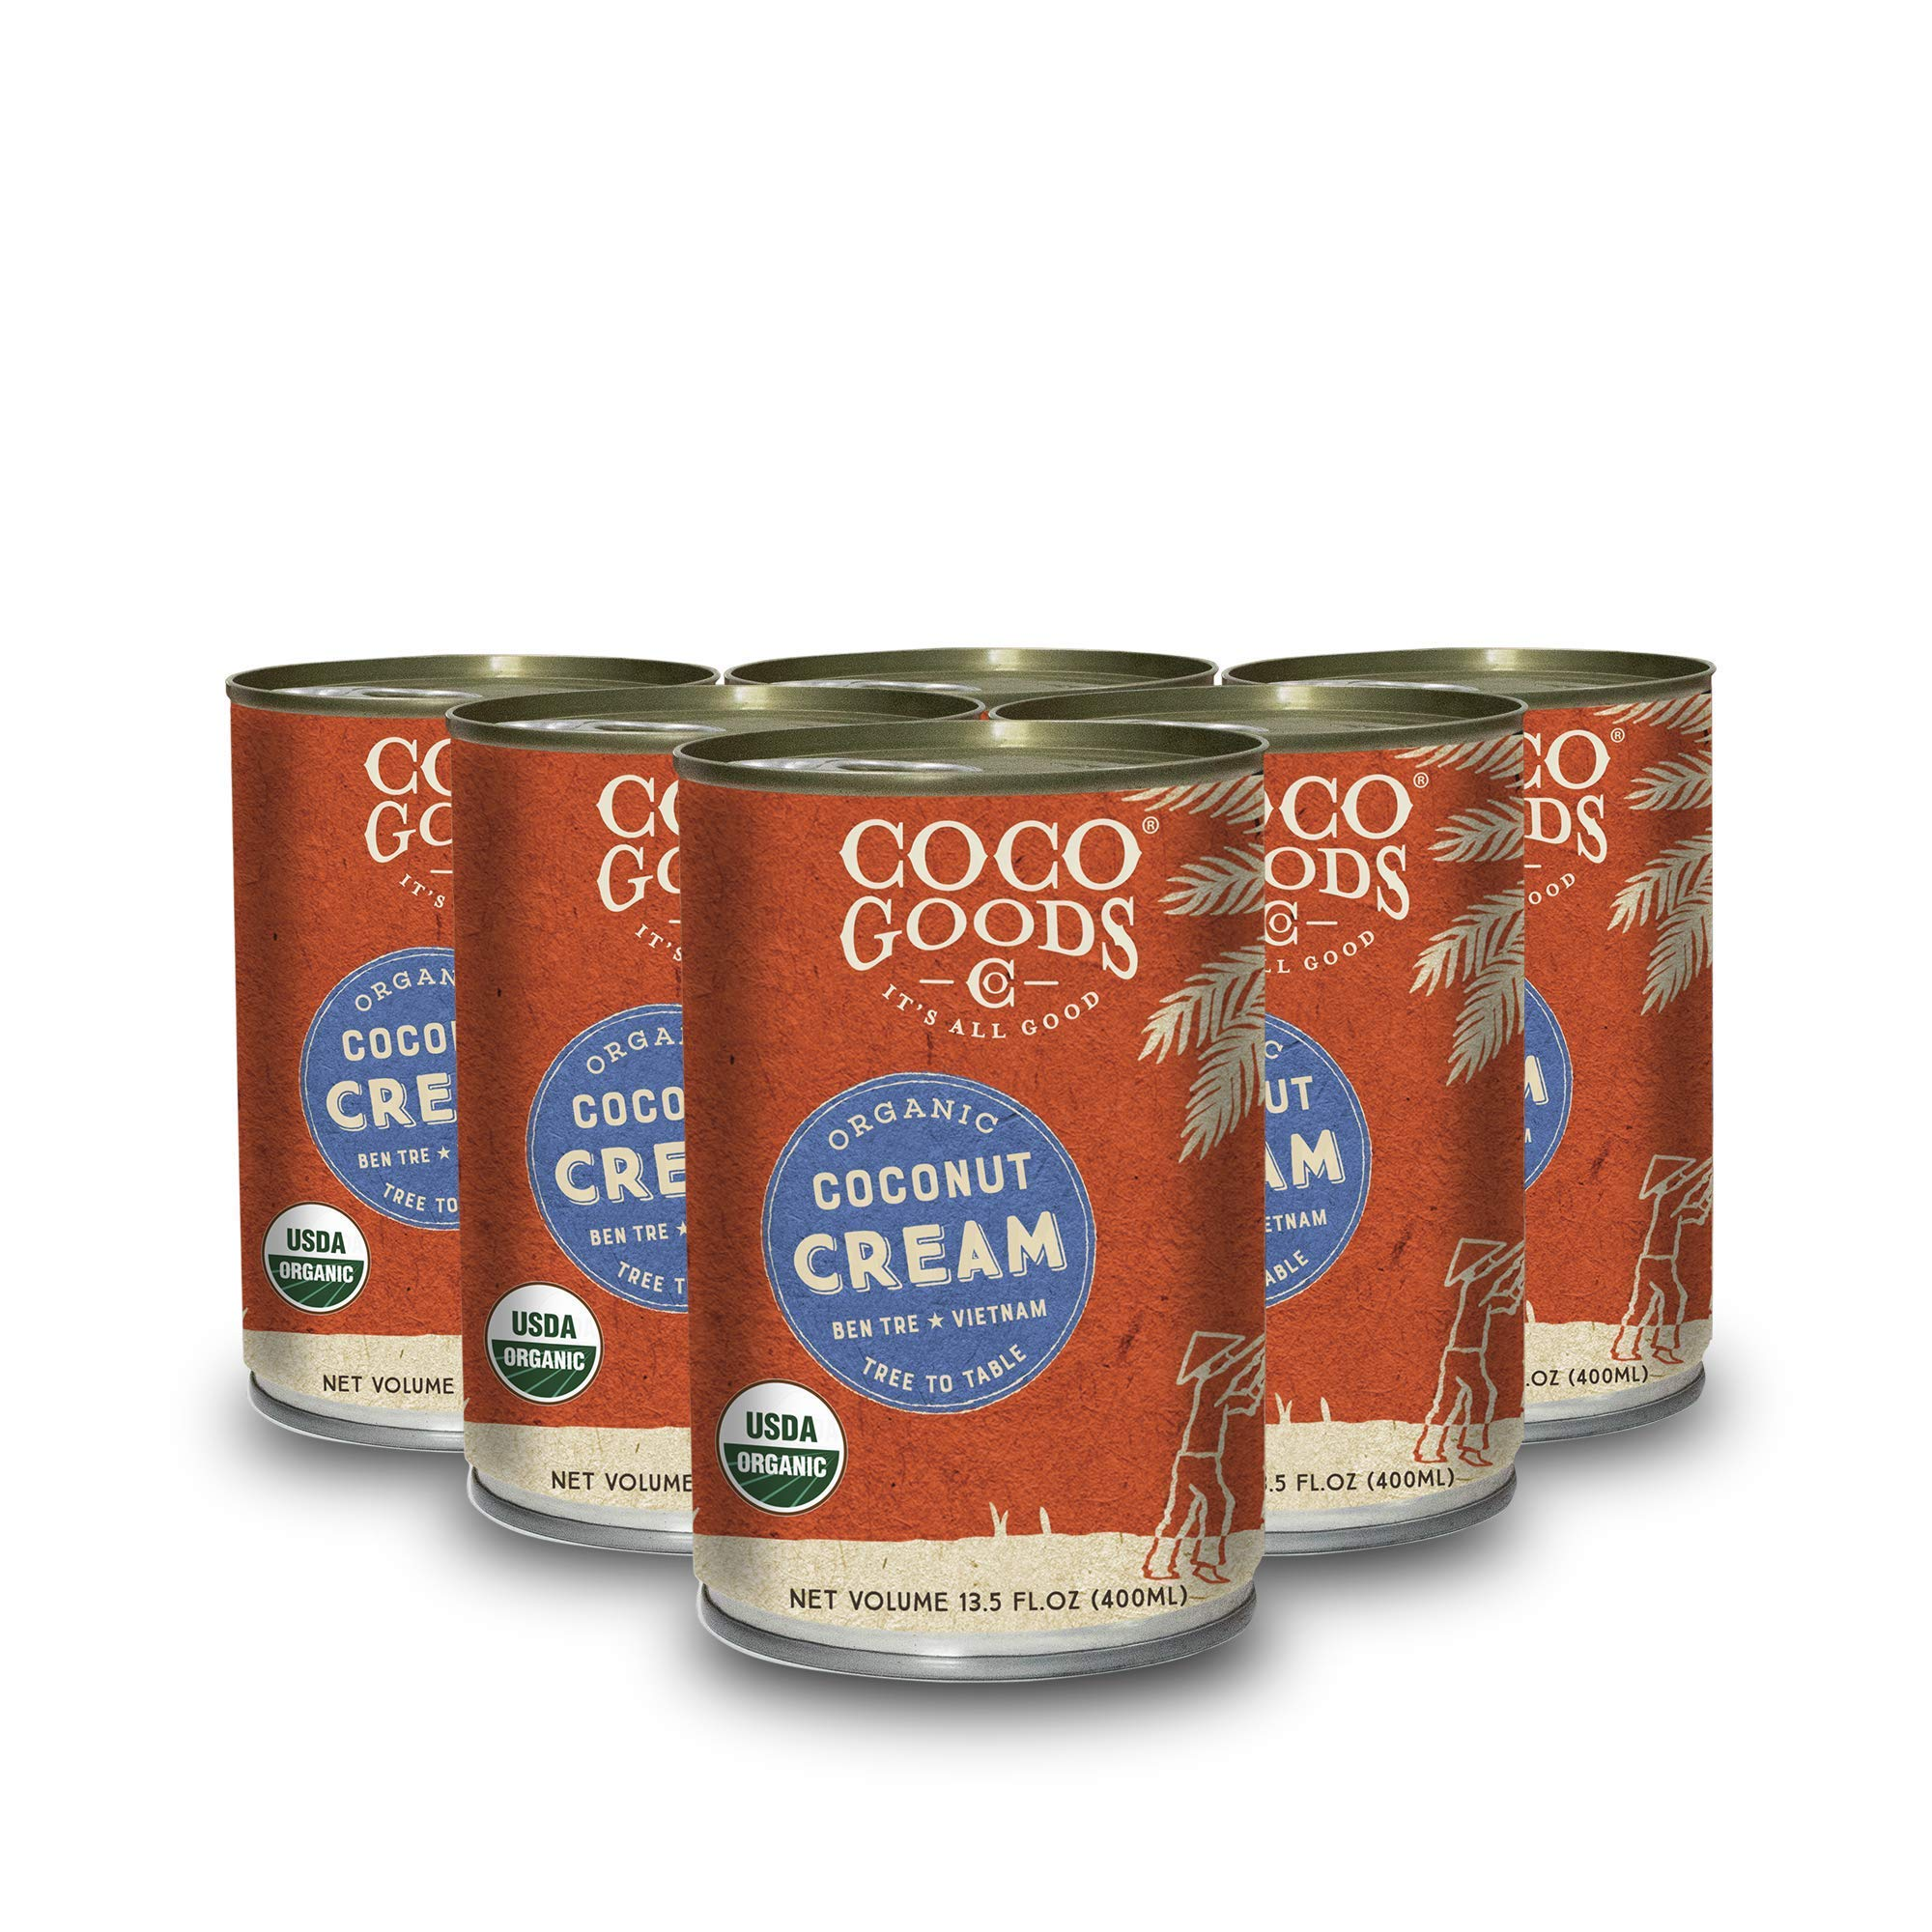 CocoGoods Co. Vietnam Single-Origin Organic Coconut Cream 13.5 oz - Gluten-free, Non-GMO, Vegan, & Dairy-free (Pack of 6)